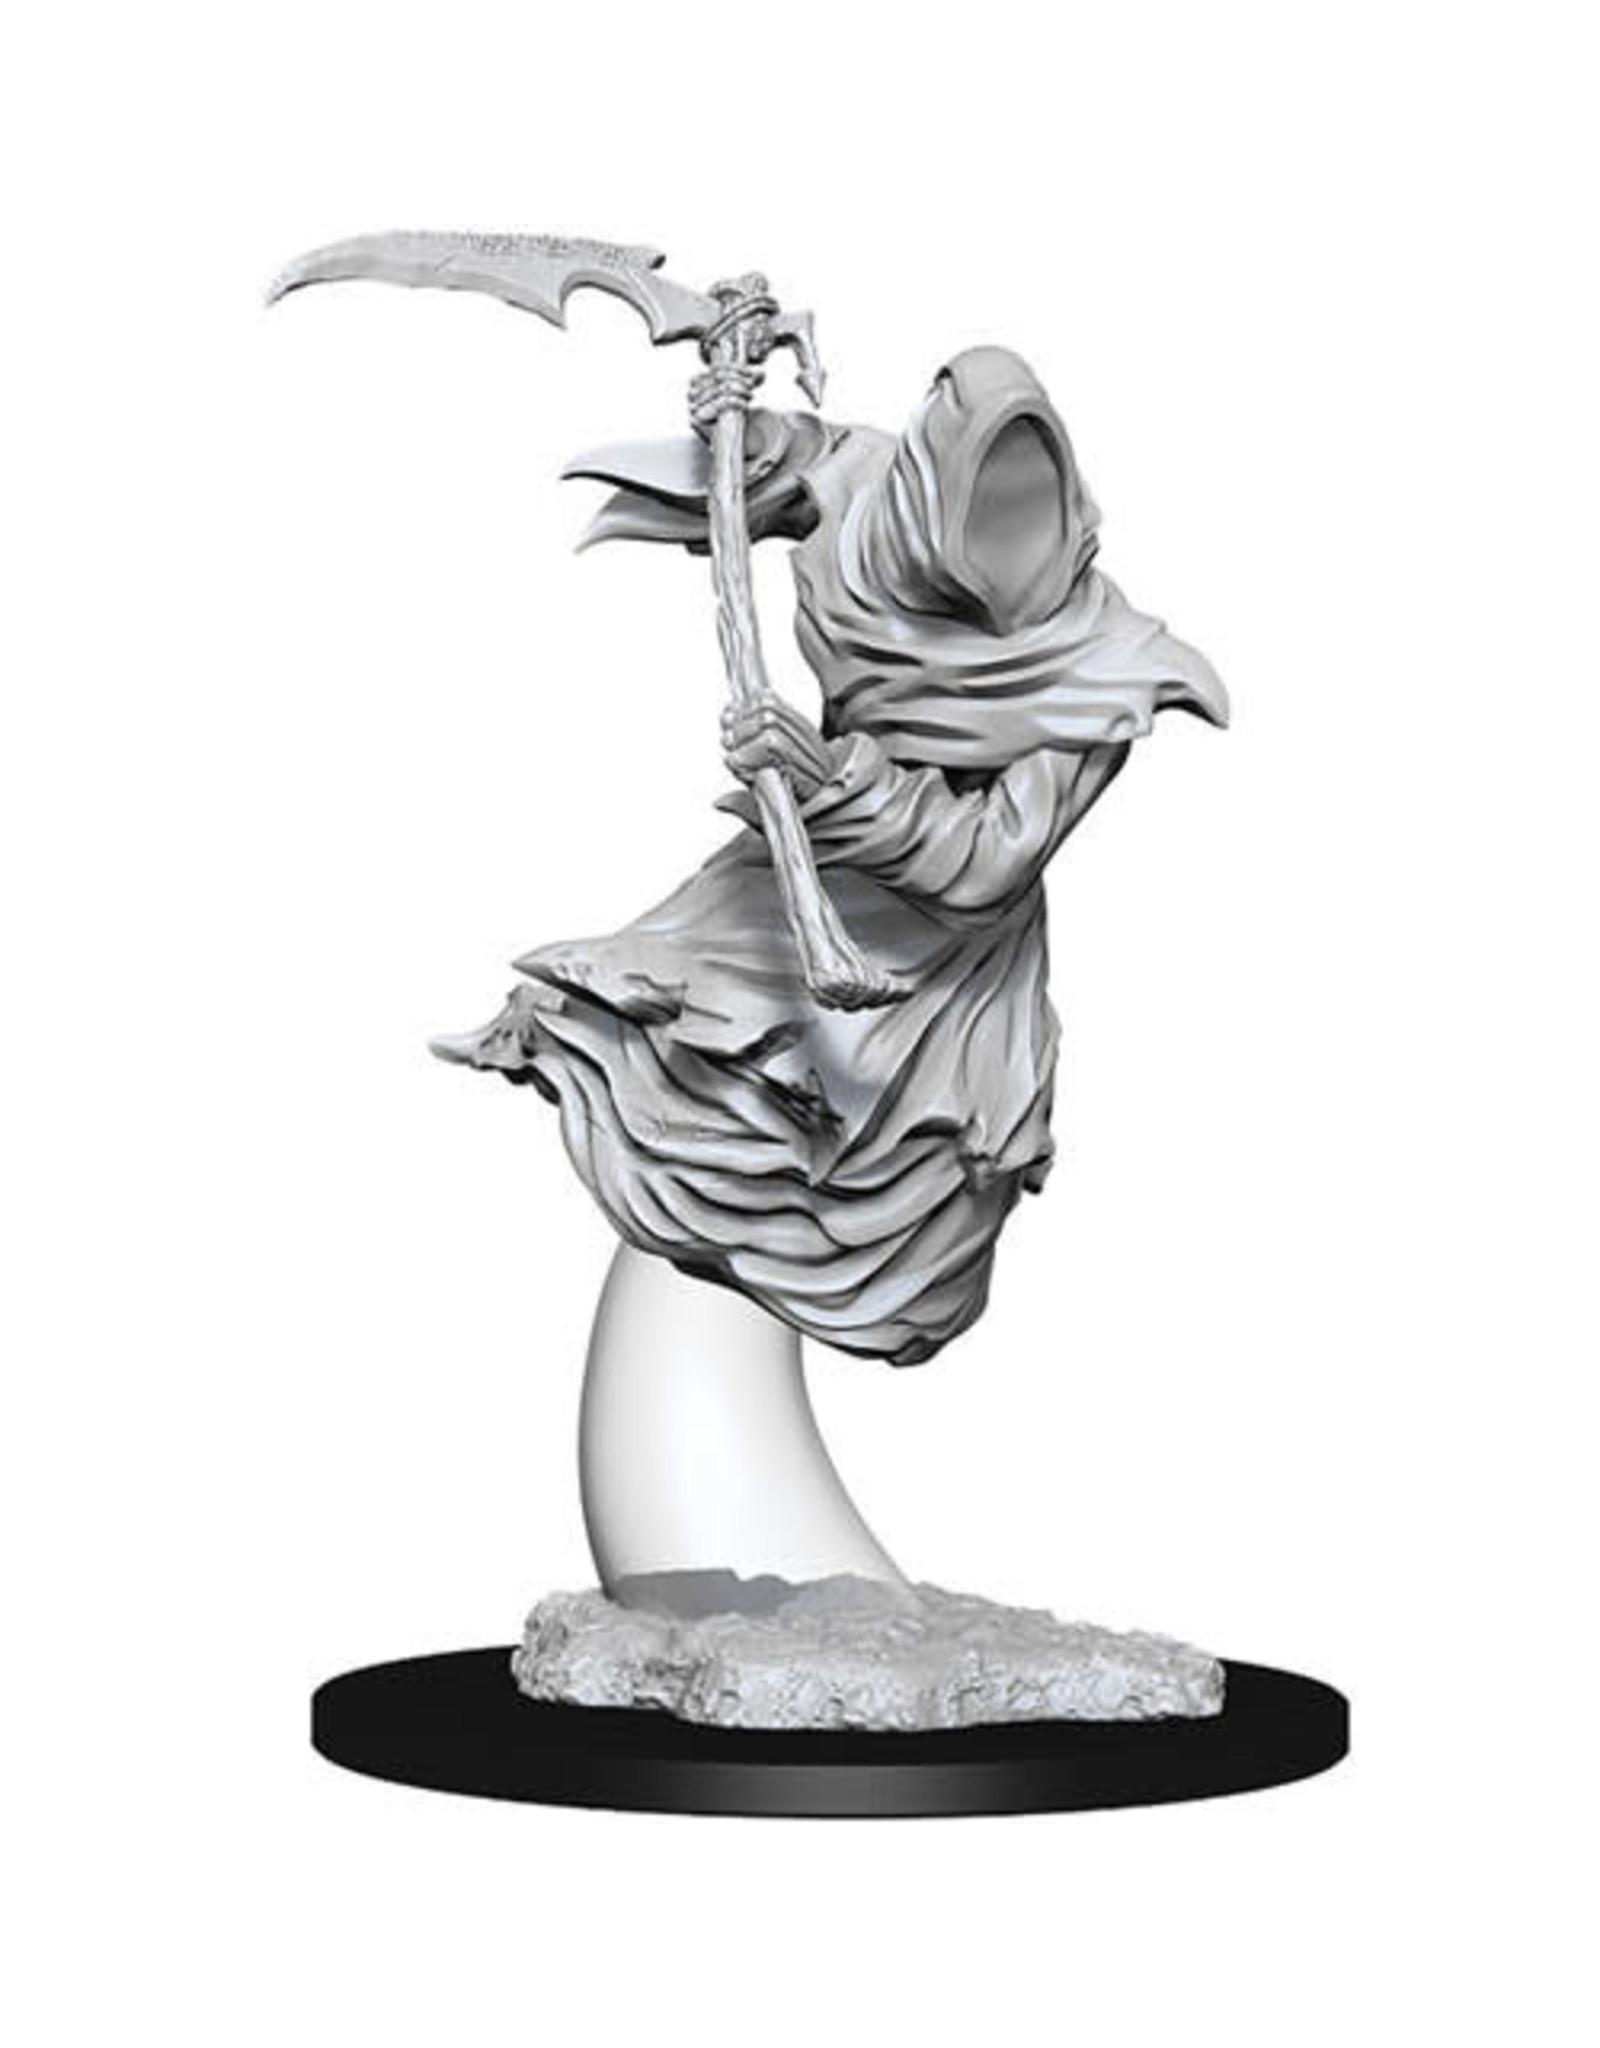 WizKids Pathfinder Deep Cuts Unpainted Miniatures: W8 Grim Reaper